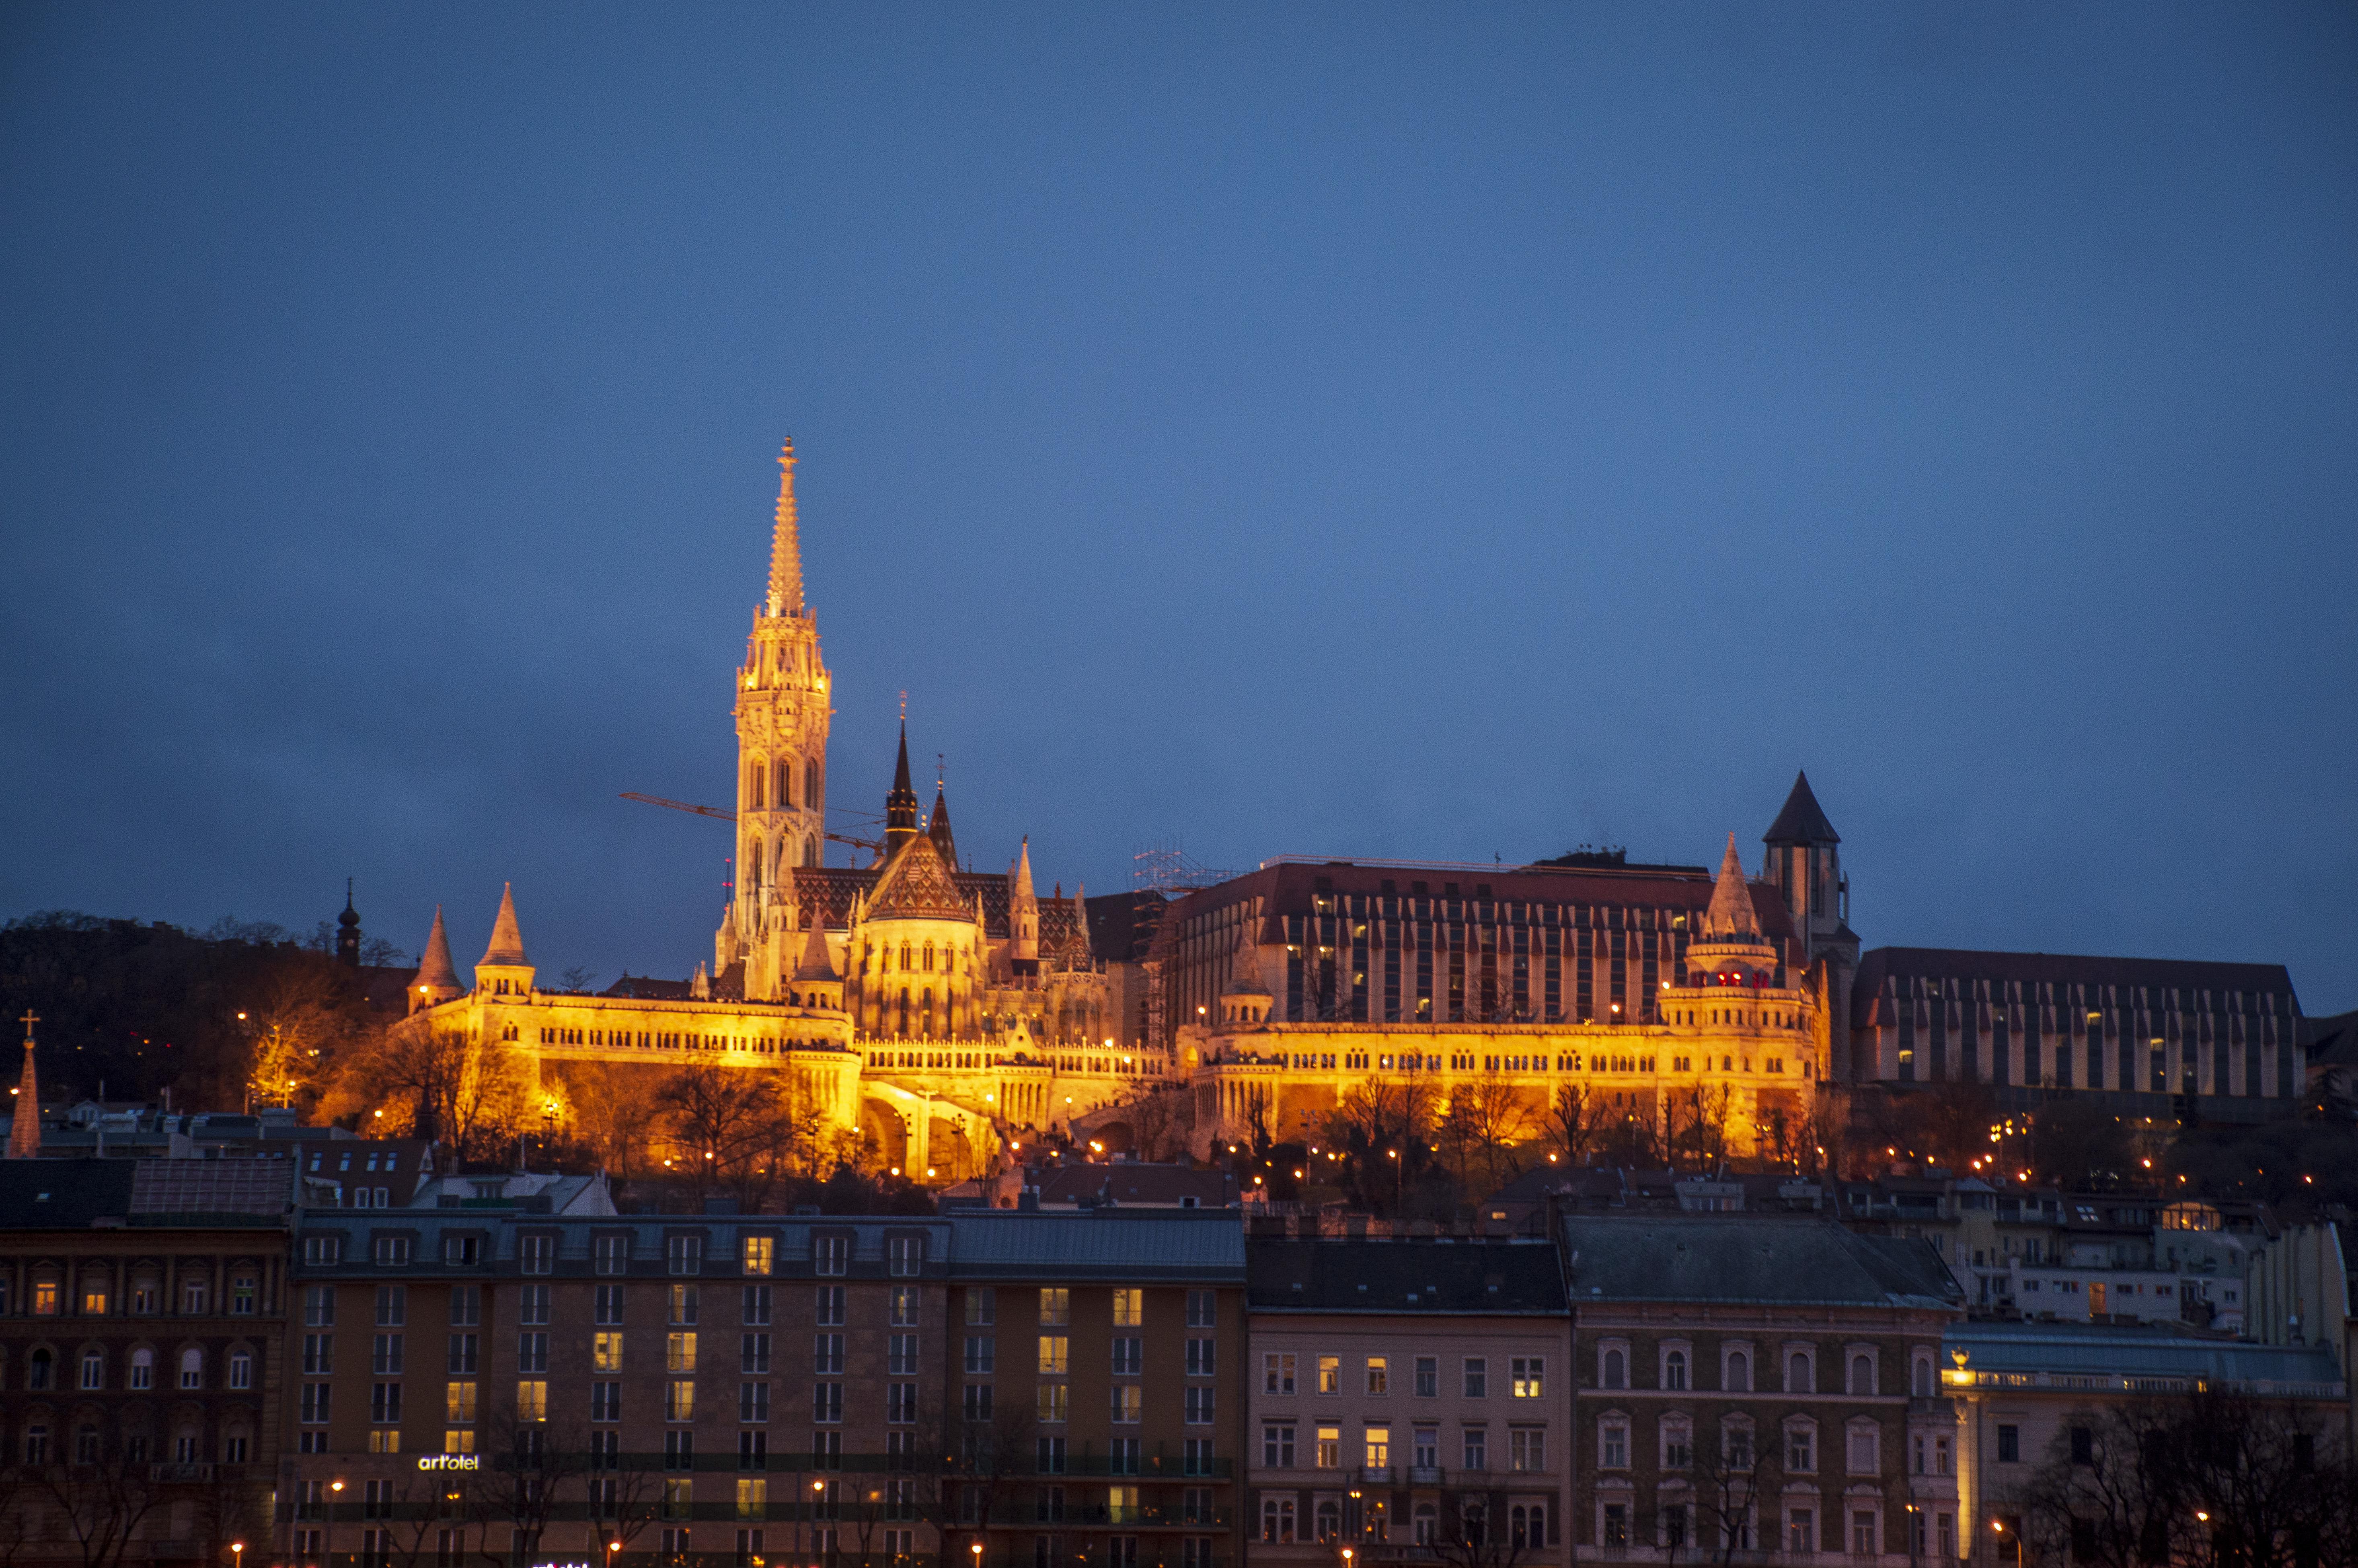 Buda_Castle_Night